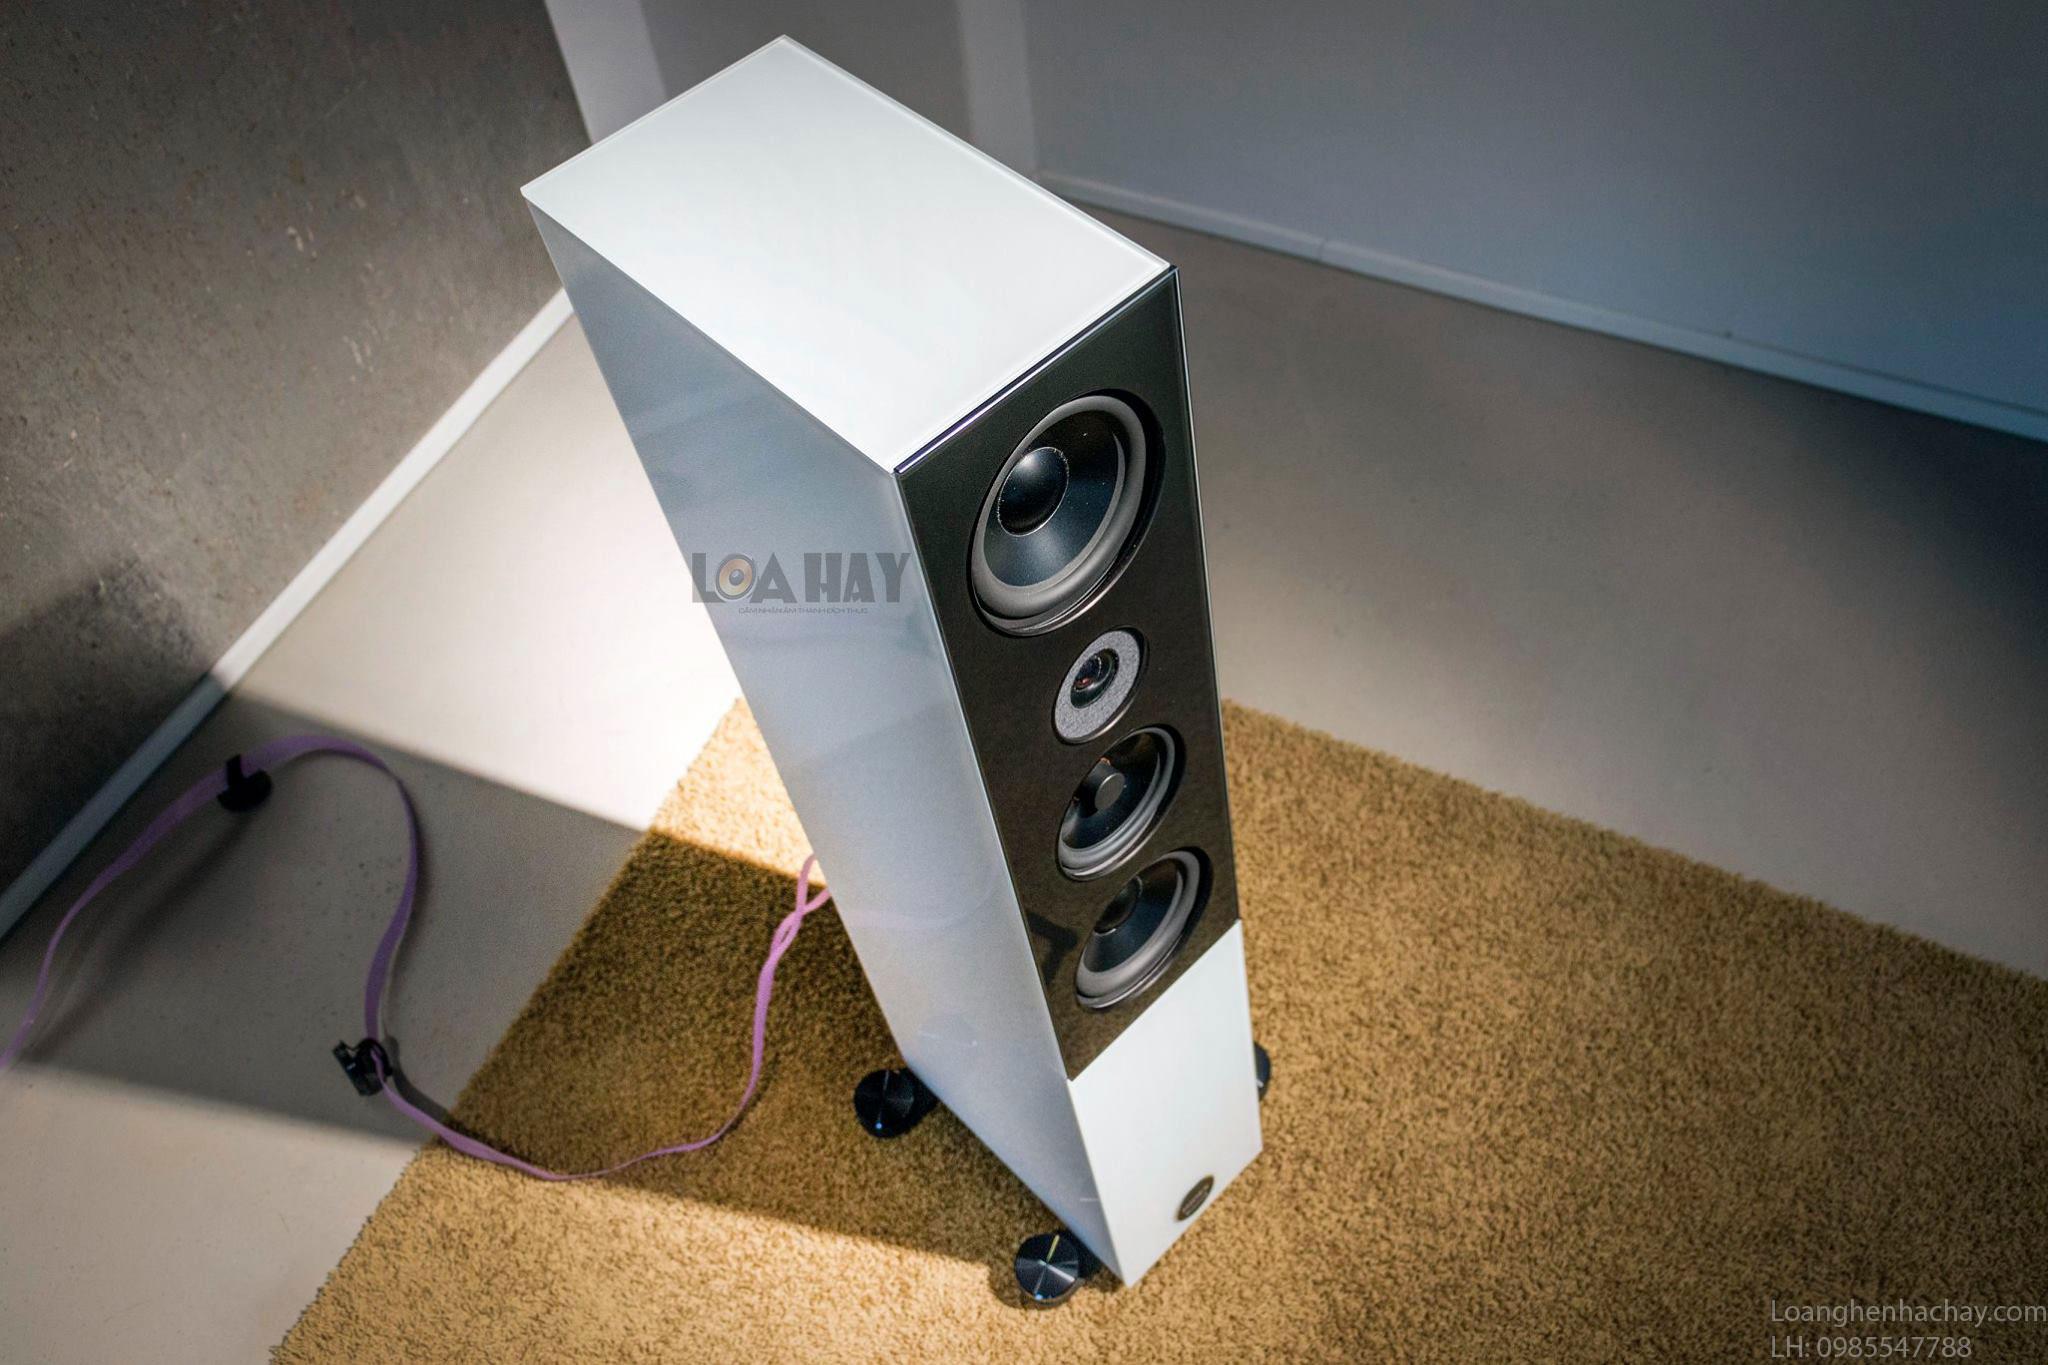 loa audio physic midex white